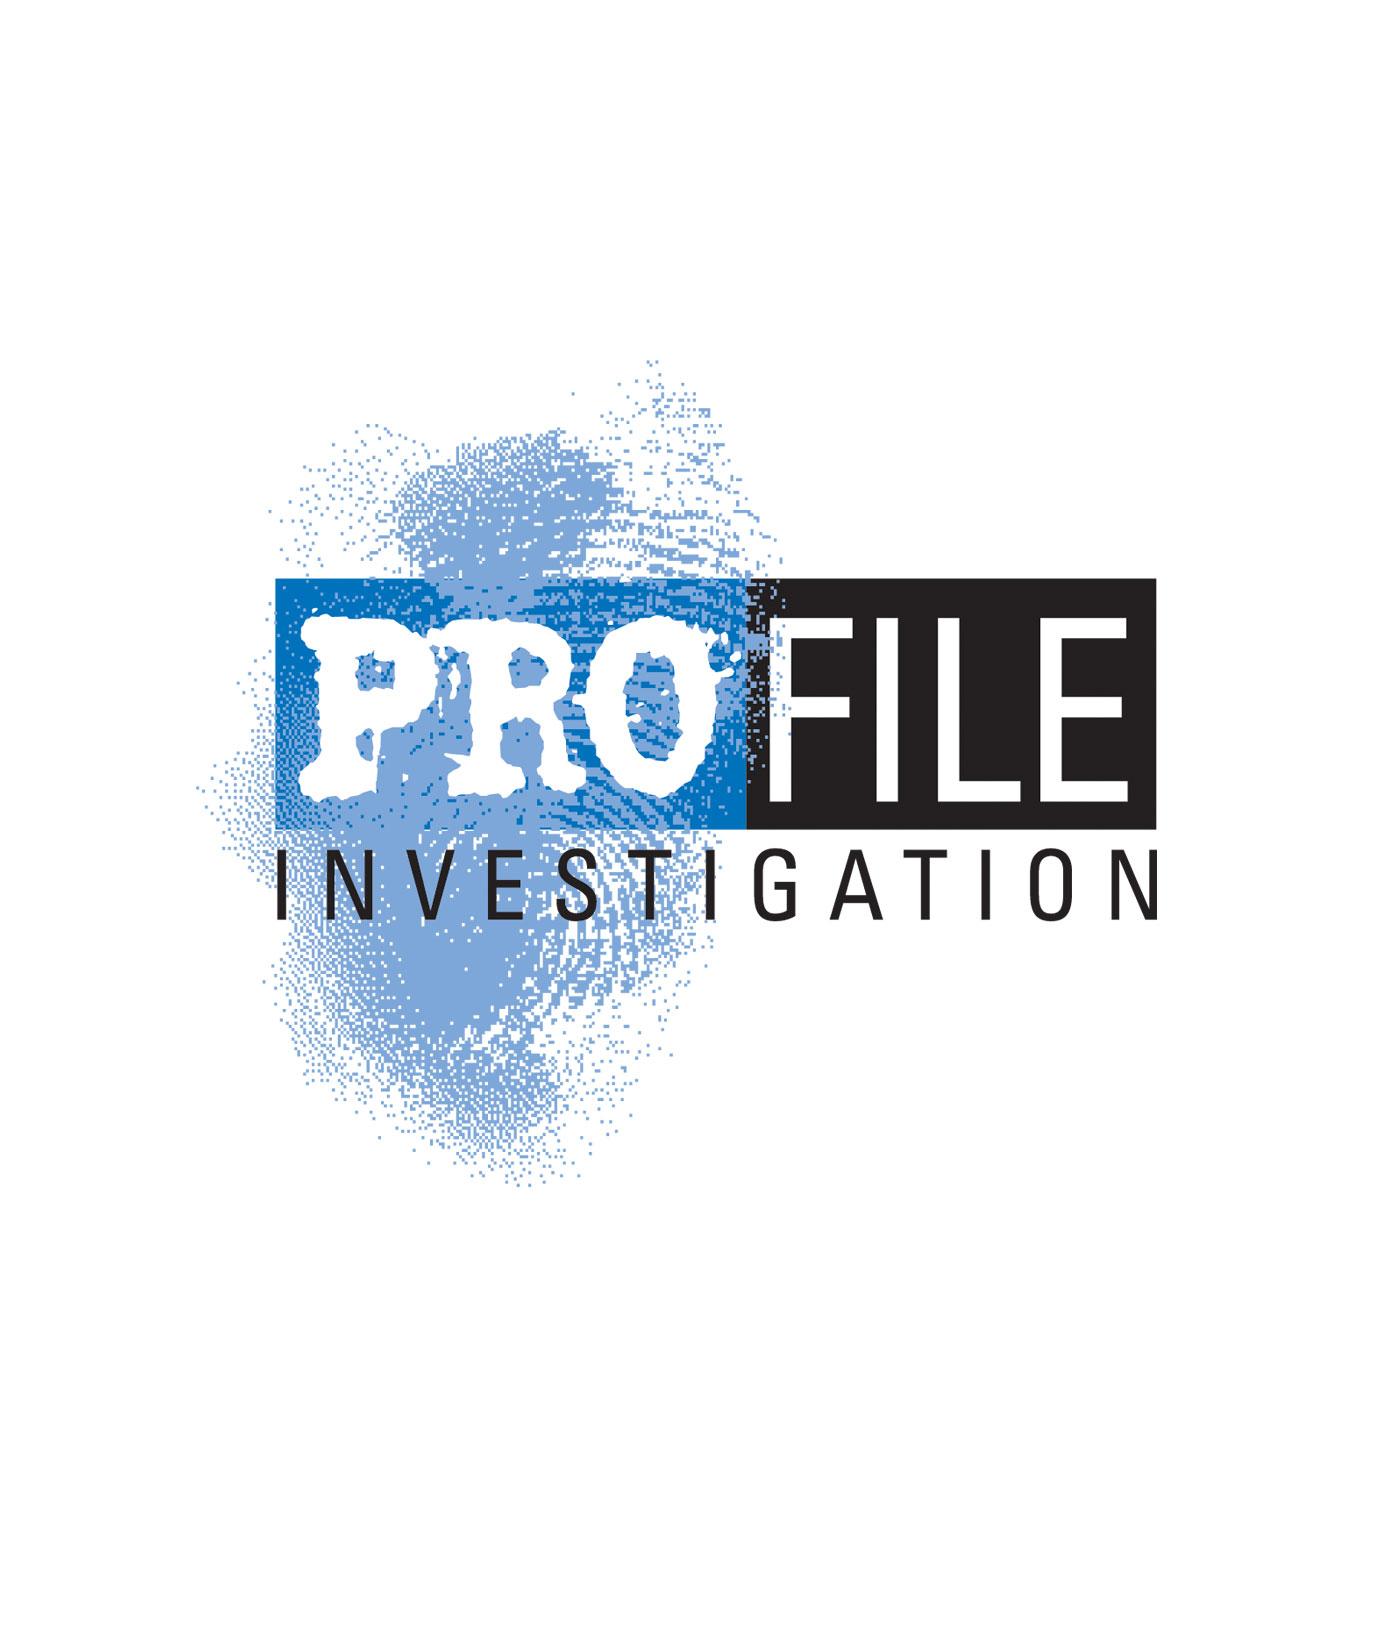 logos-profile-investigation-1400